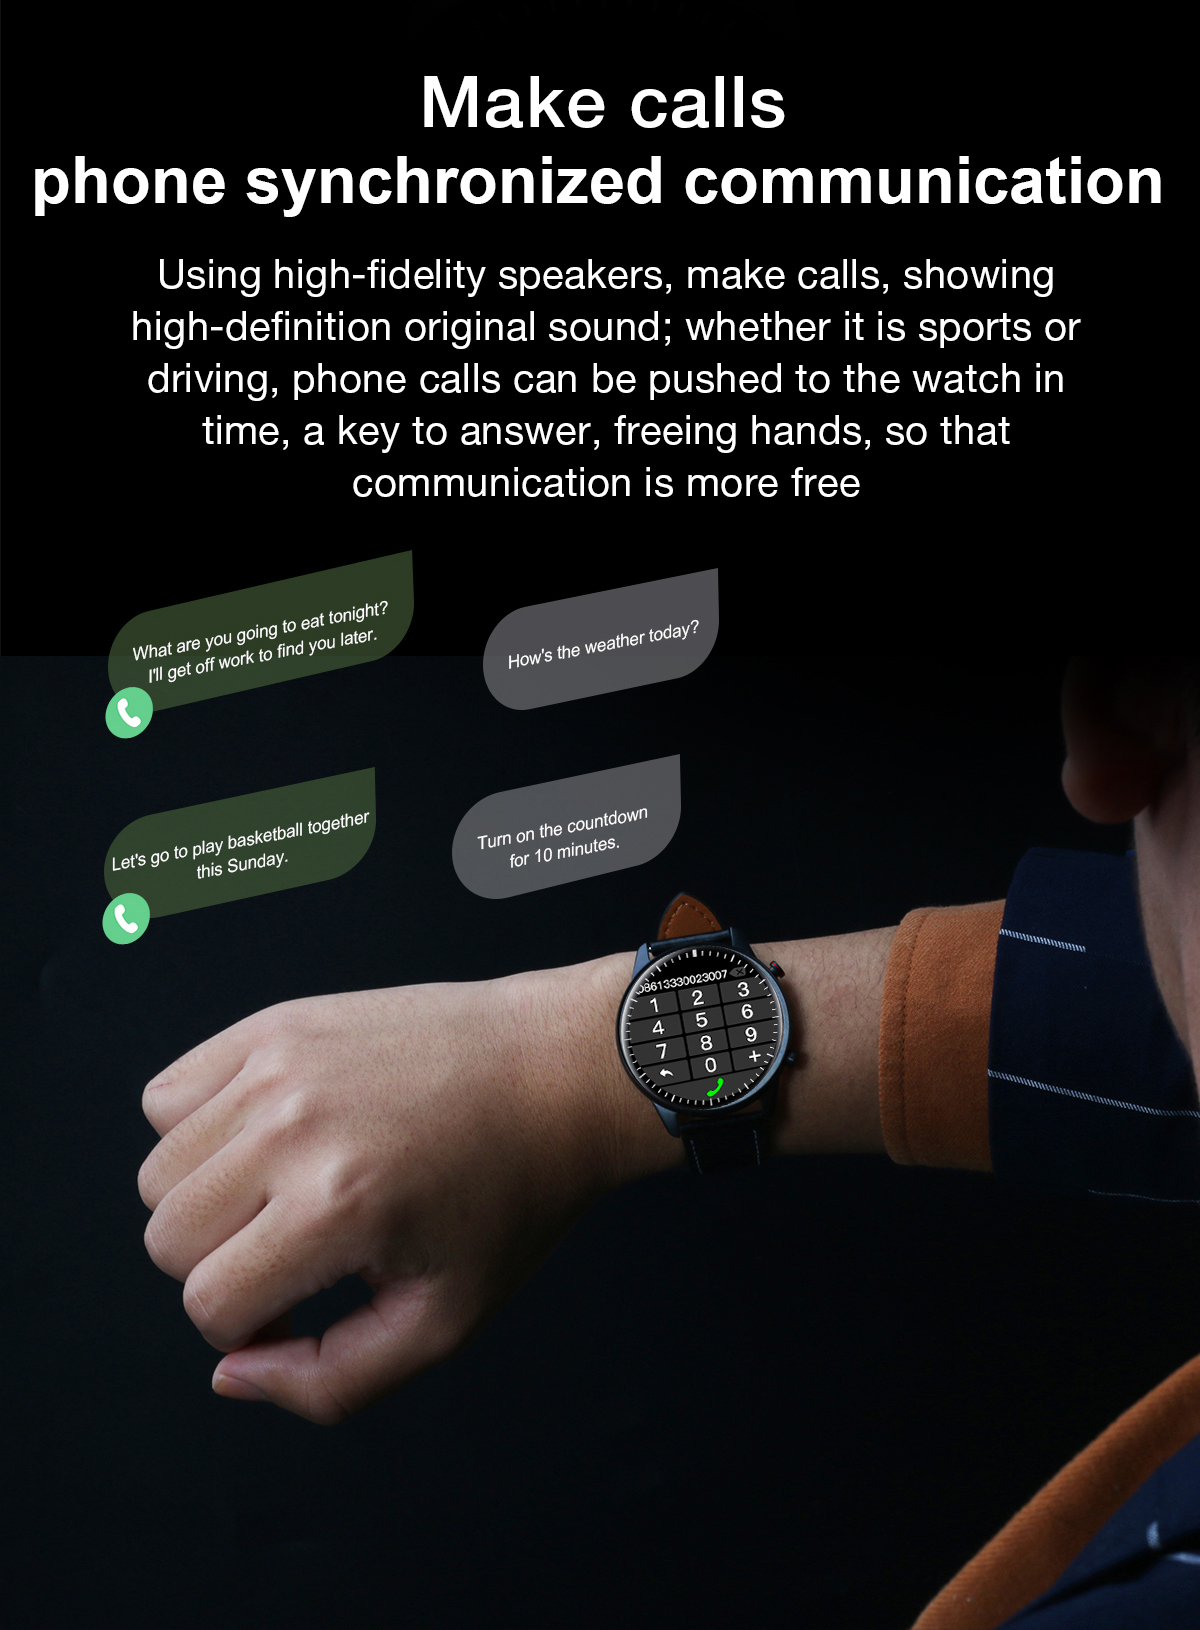 H5e60cf71690441e19c38055bab659648k 2021 NEW Smart Watch Women Men Full Touch Fitness Tracker IP67 Waterproof Smartwatch For Android Xiaomi Redmi